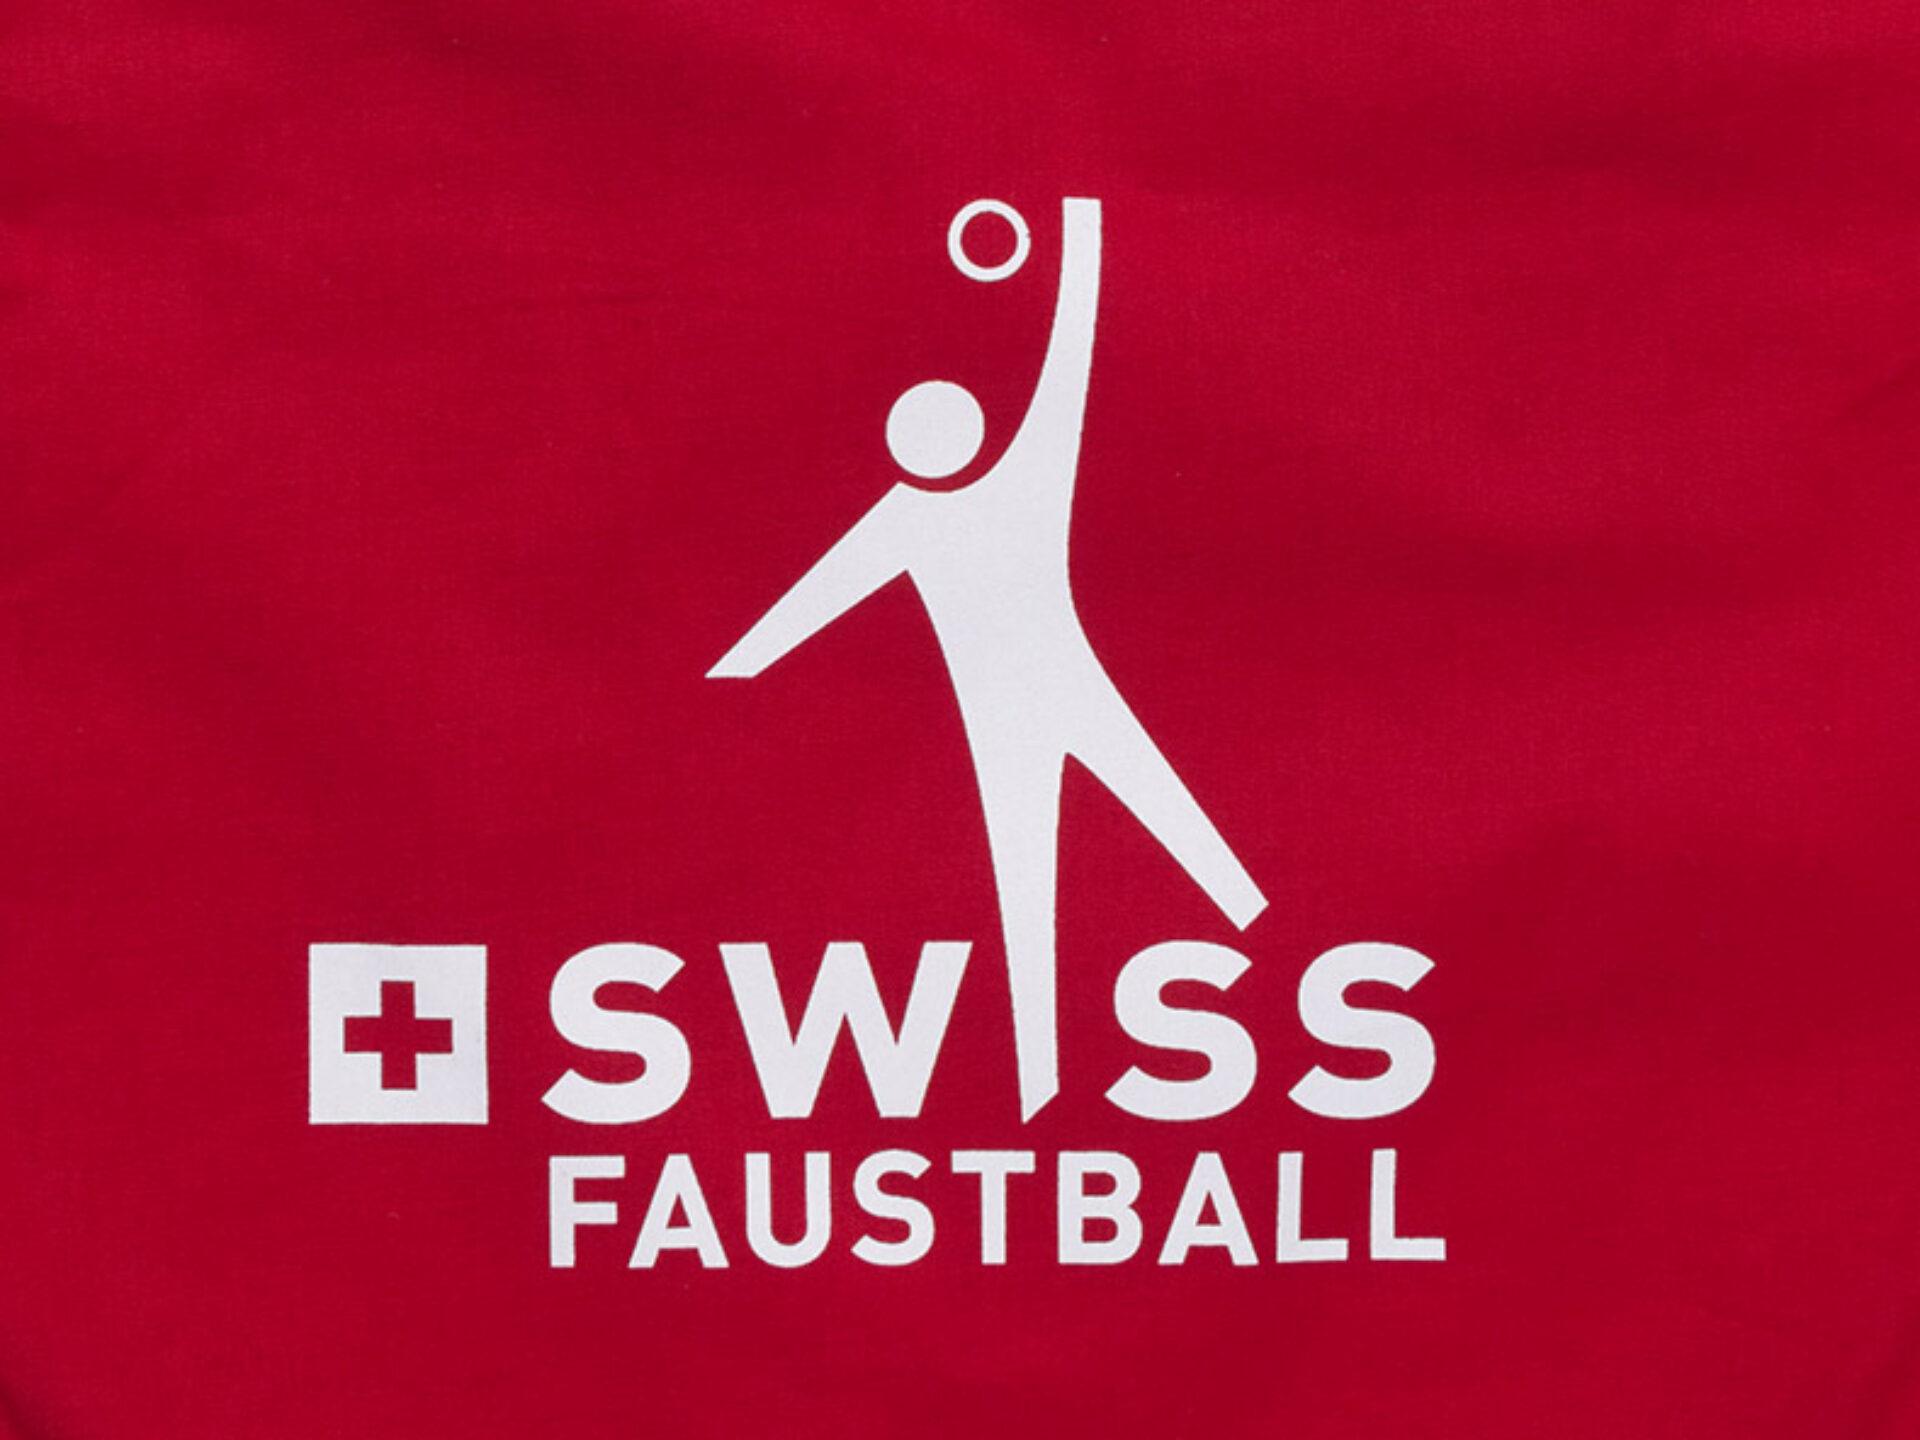 swiss-faustball-kordelrucksack-gym-bag-siebdruck